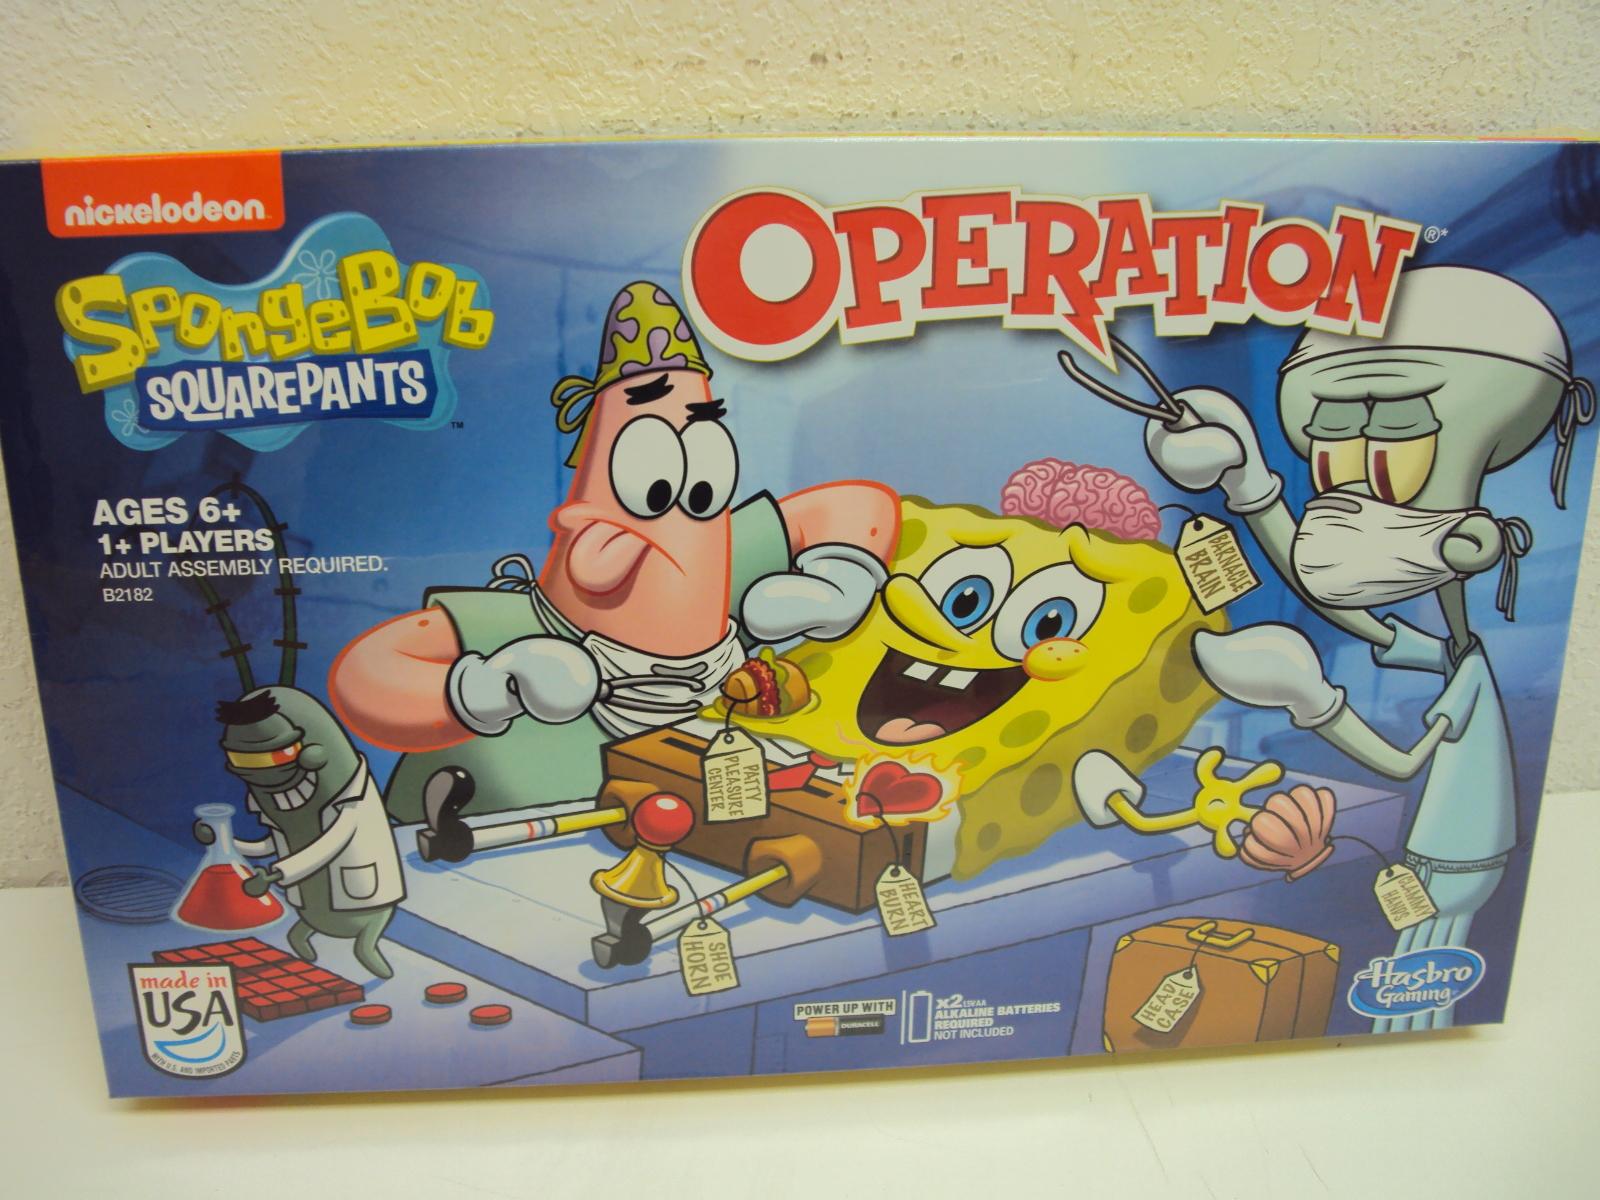 Nickelodeon SpongeBob SquarePants Operation Game | eBay